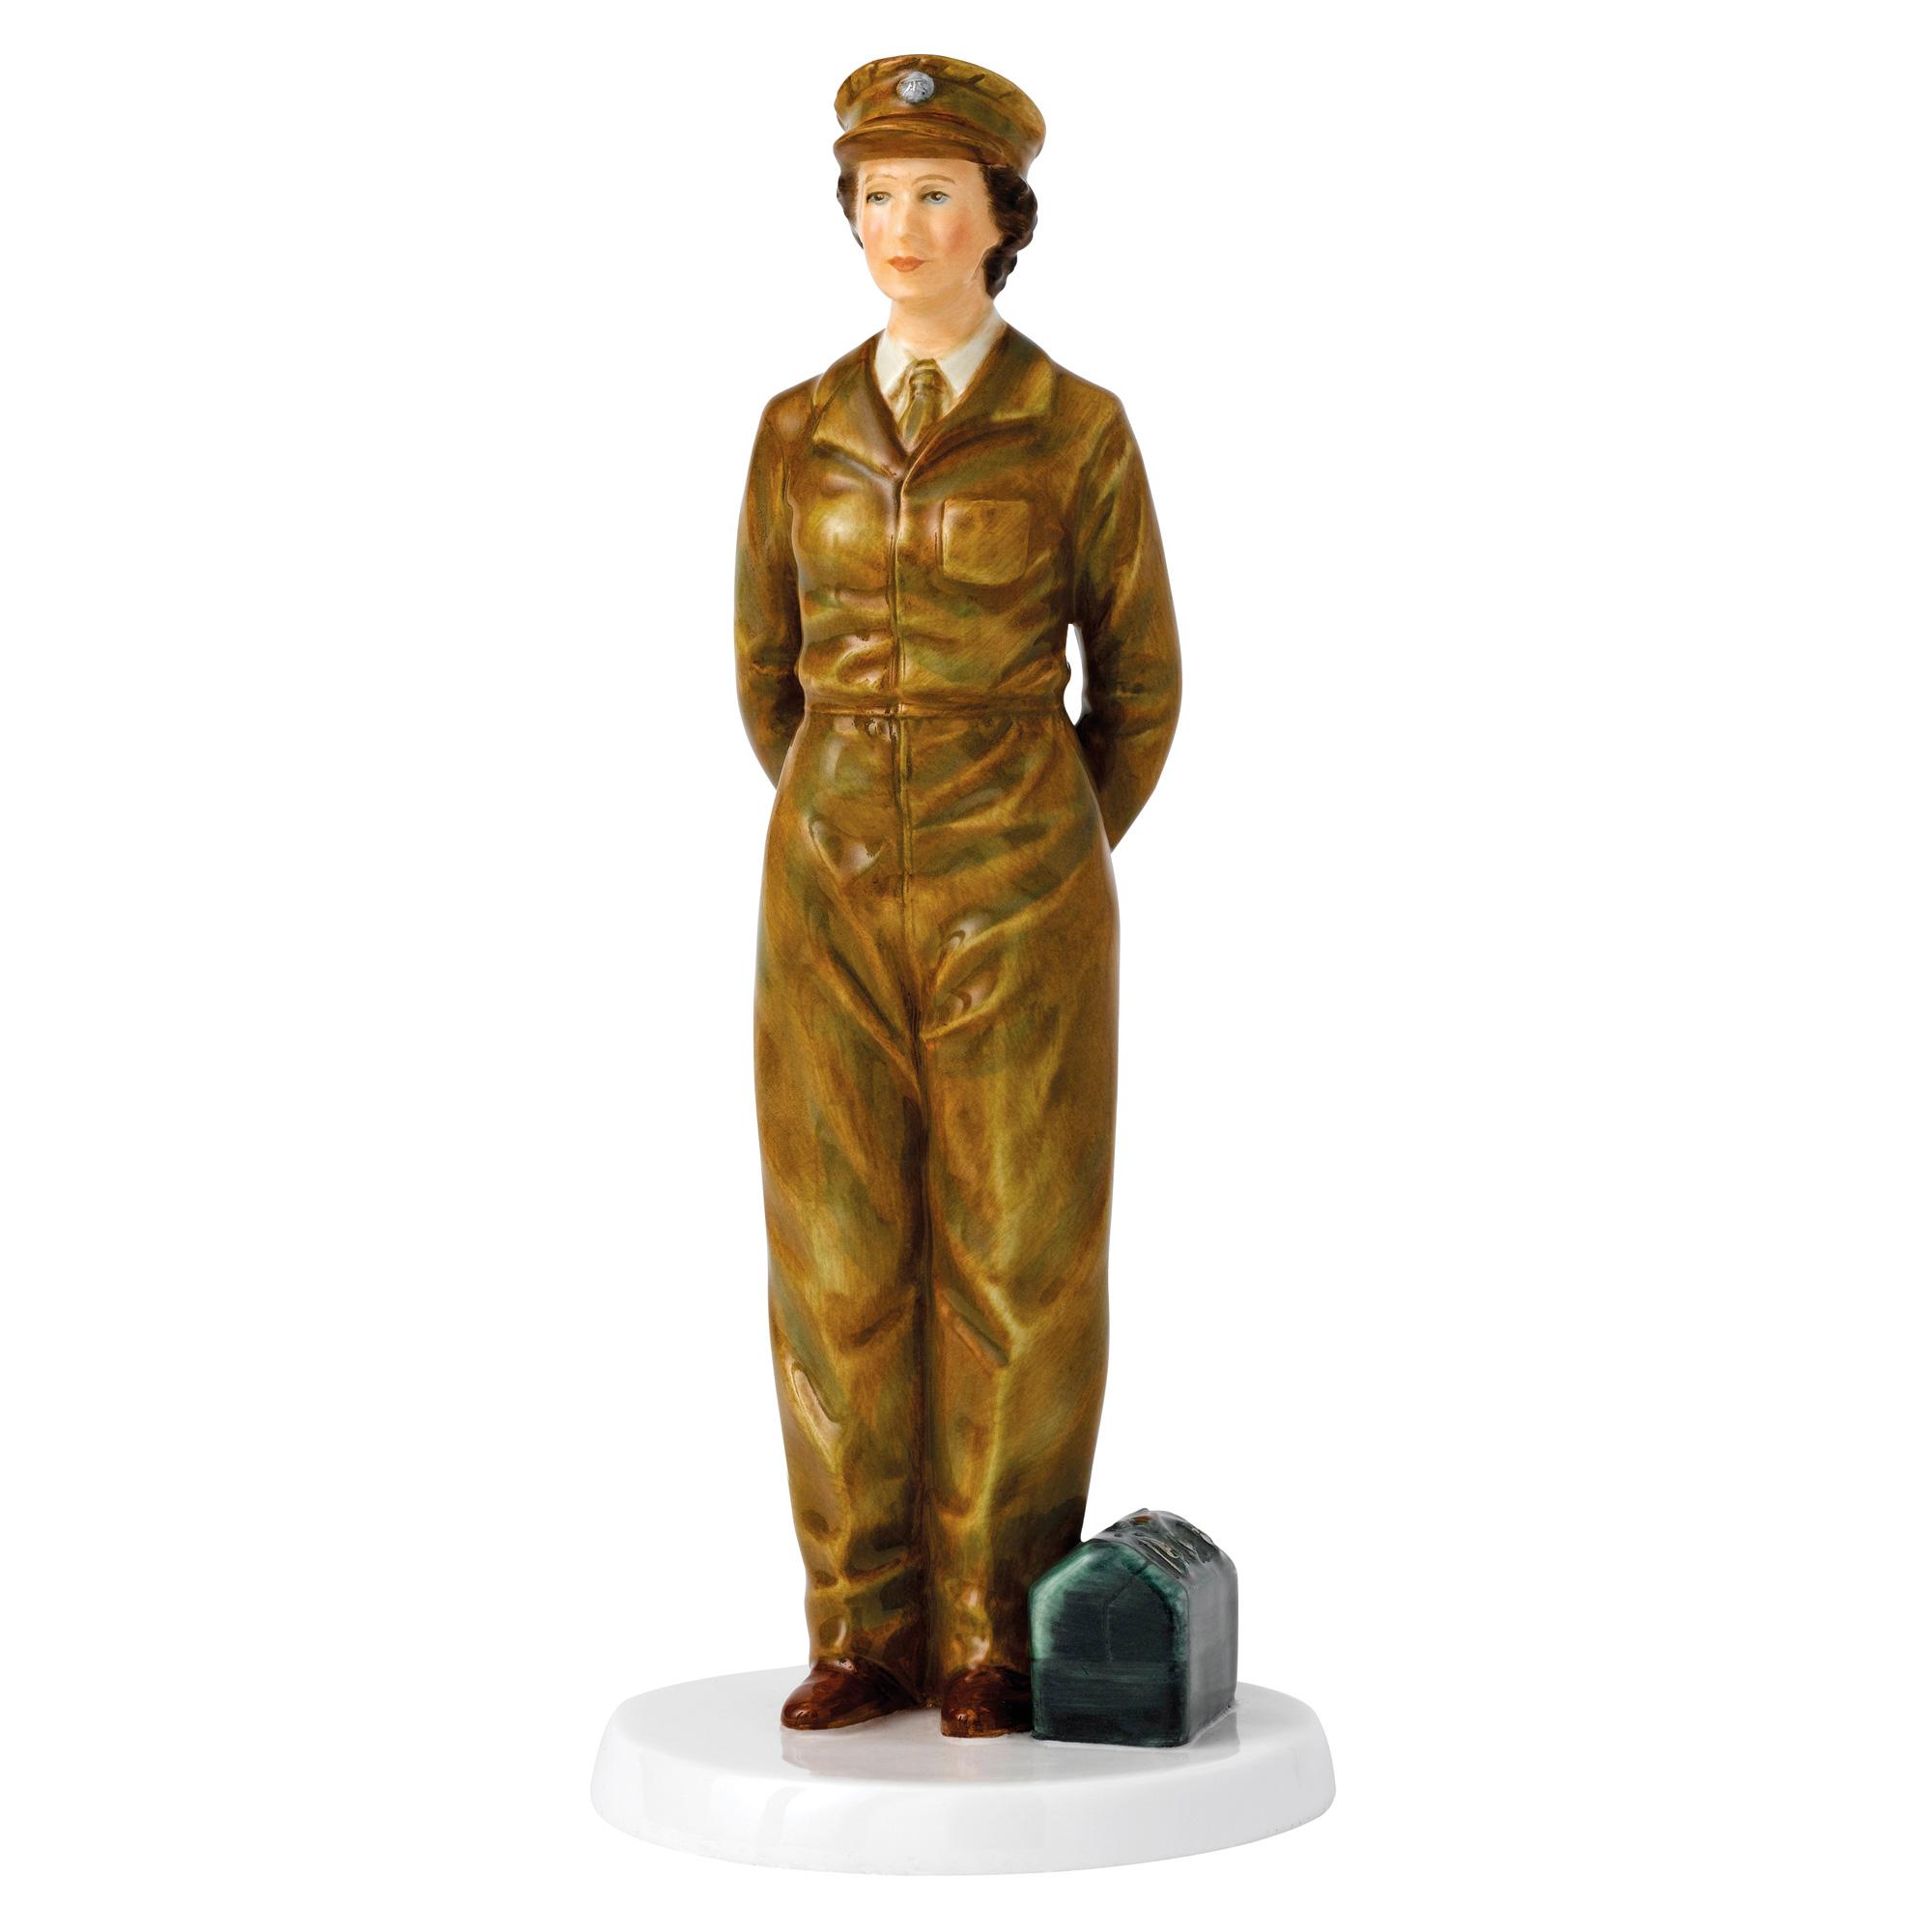 Her Majesty Army Days HN5806 - Royal Doulton Figurine